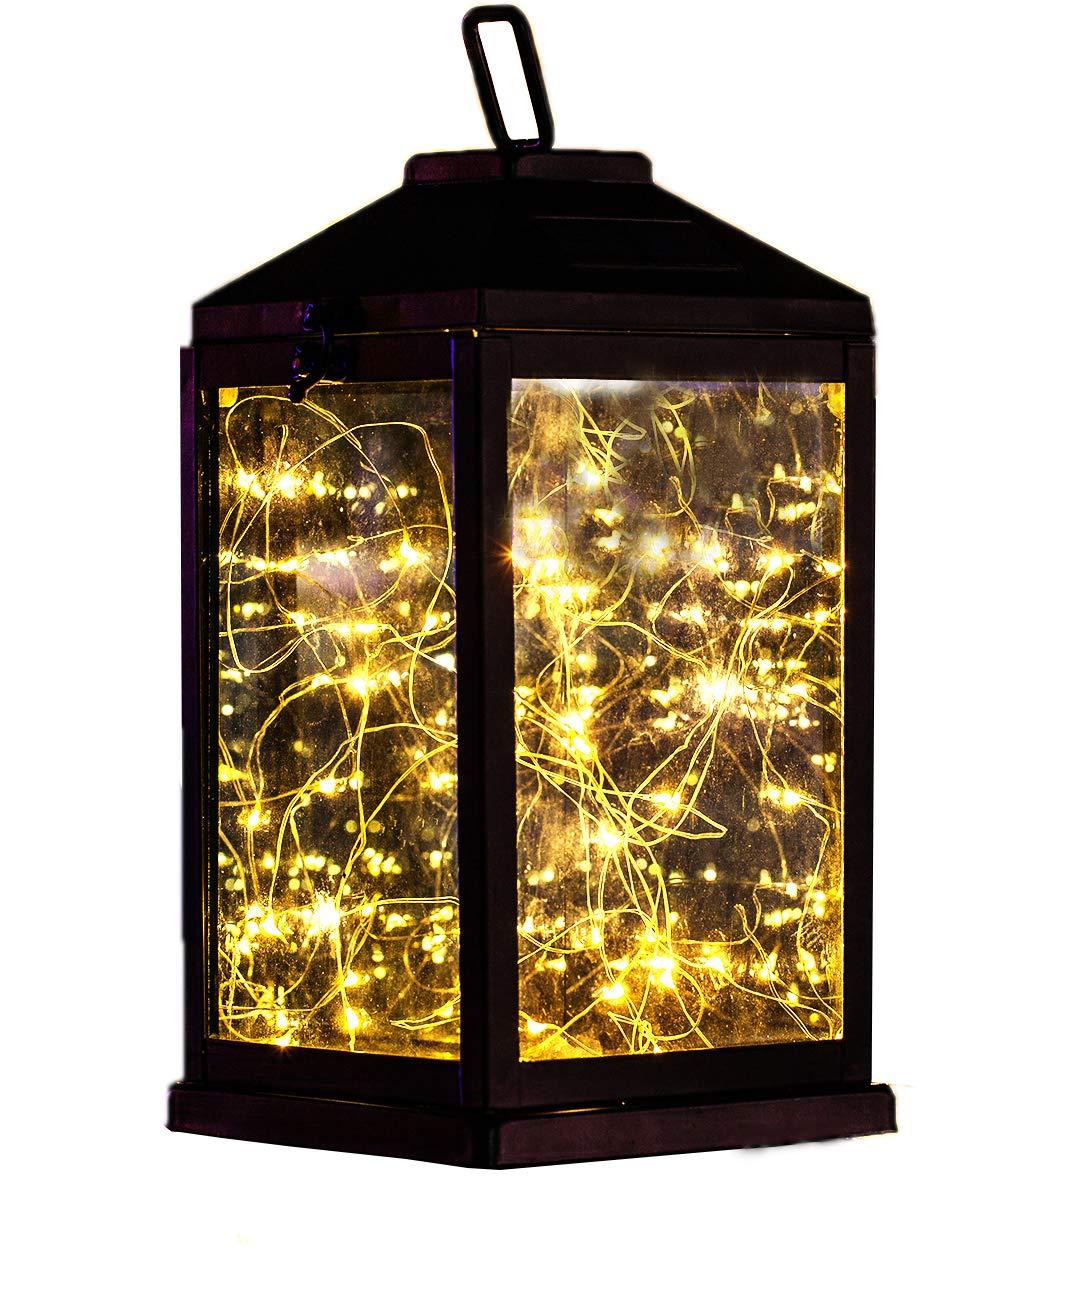 GM11217 Copper wire Decorative Camping Lights